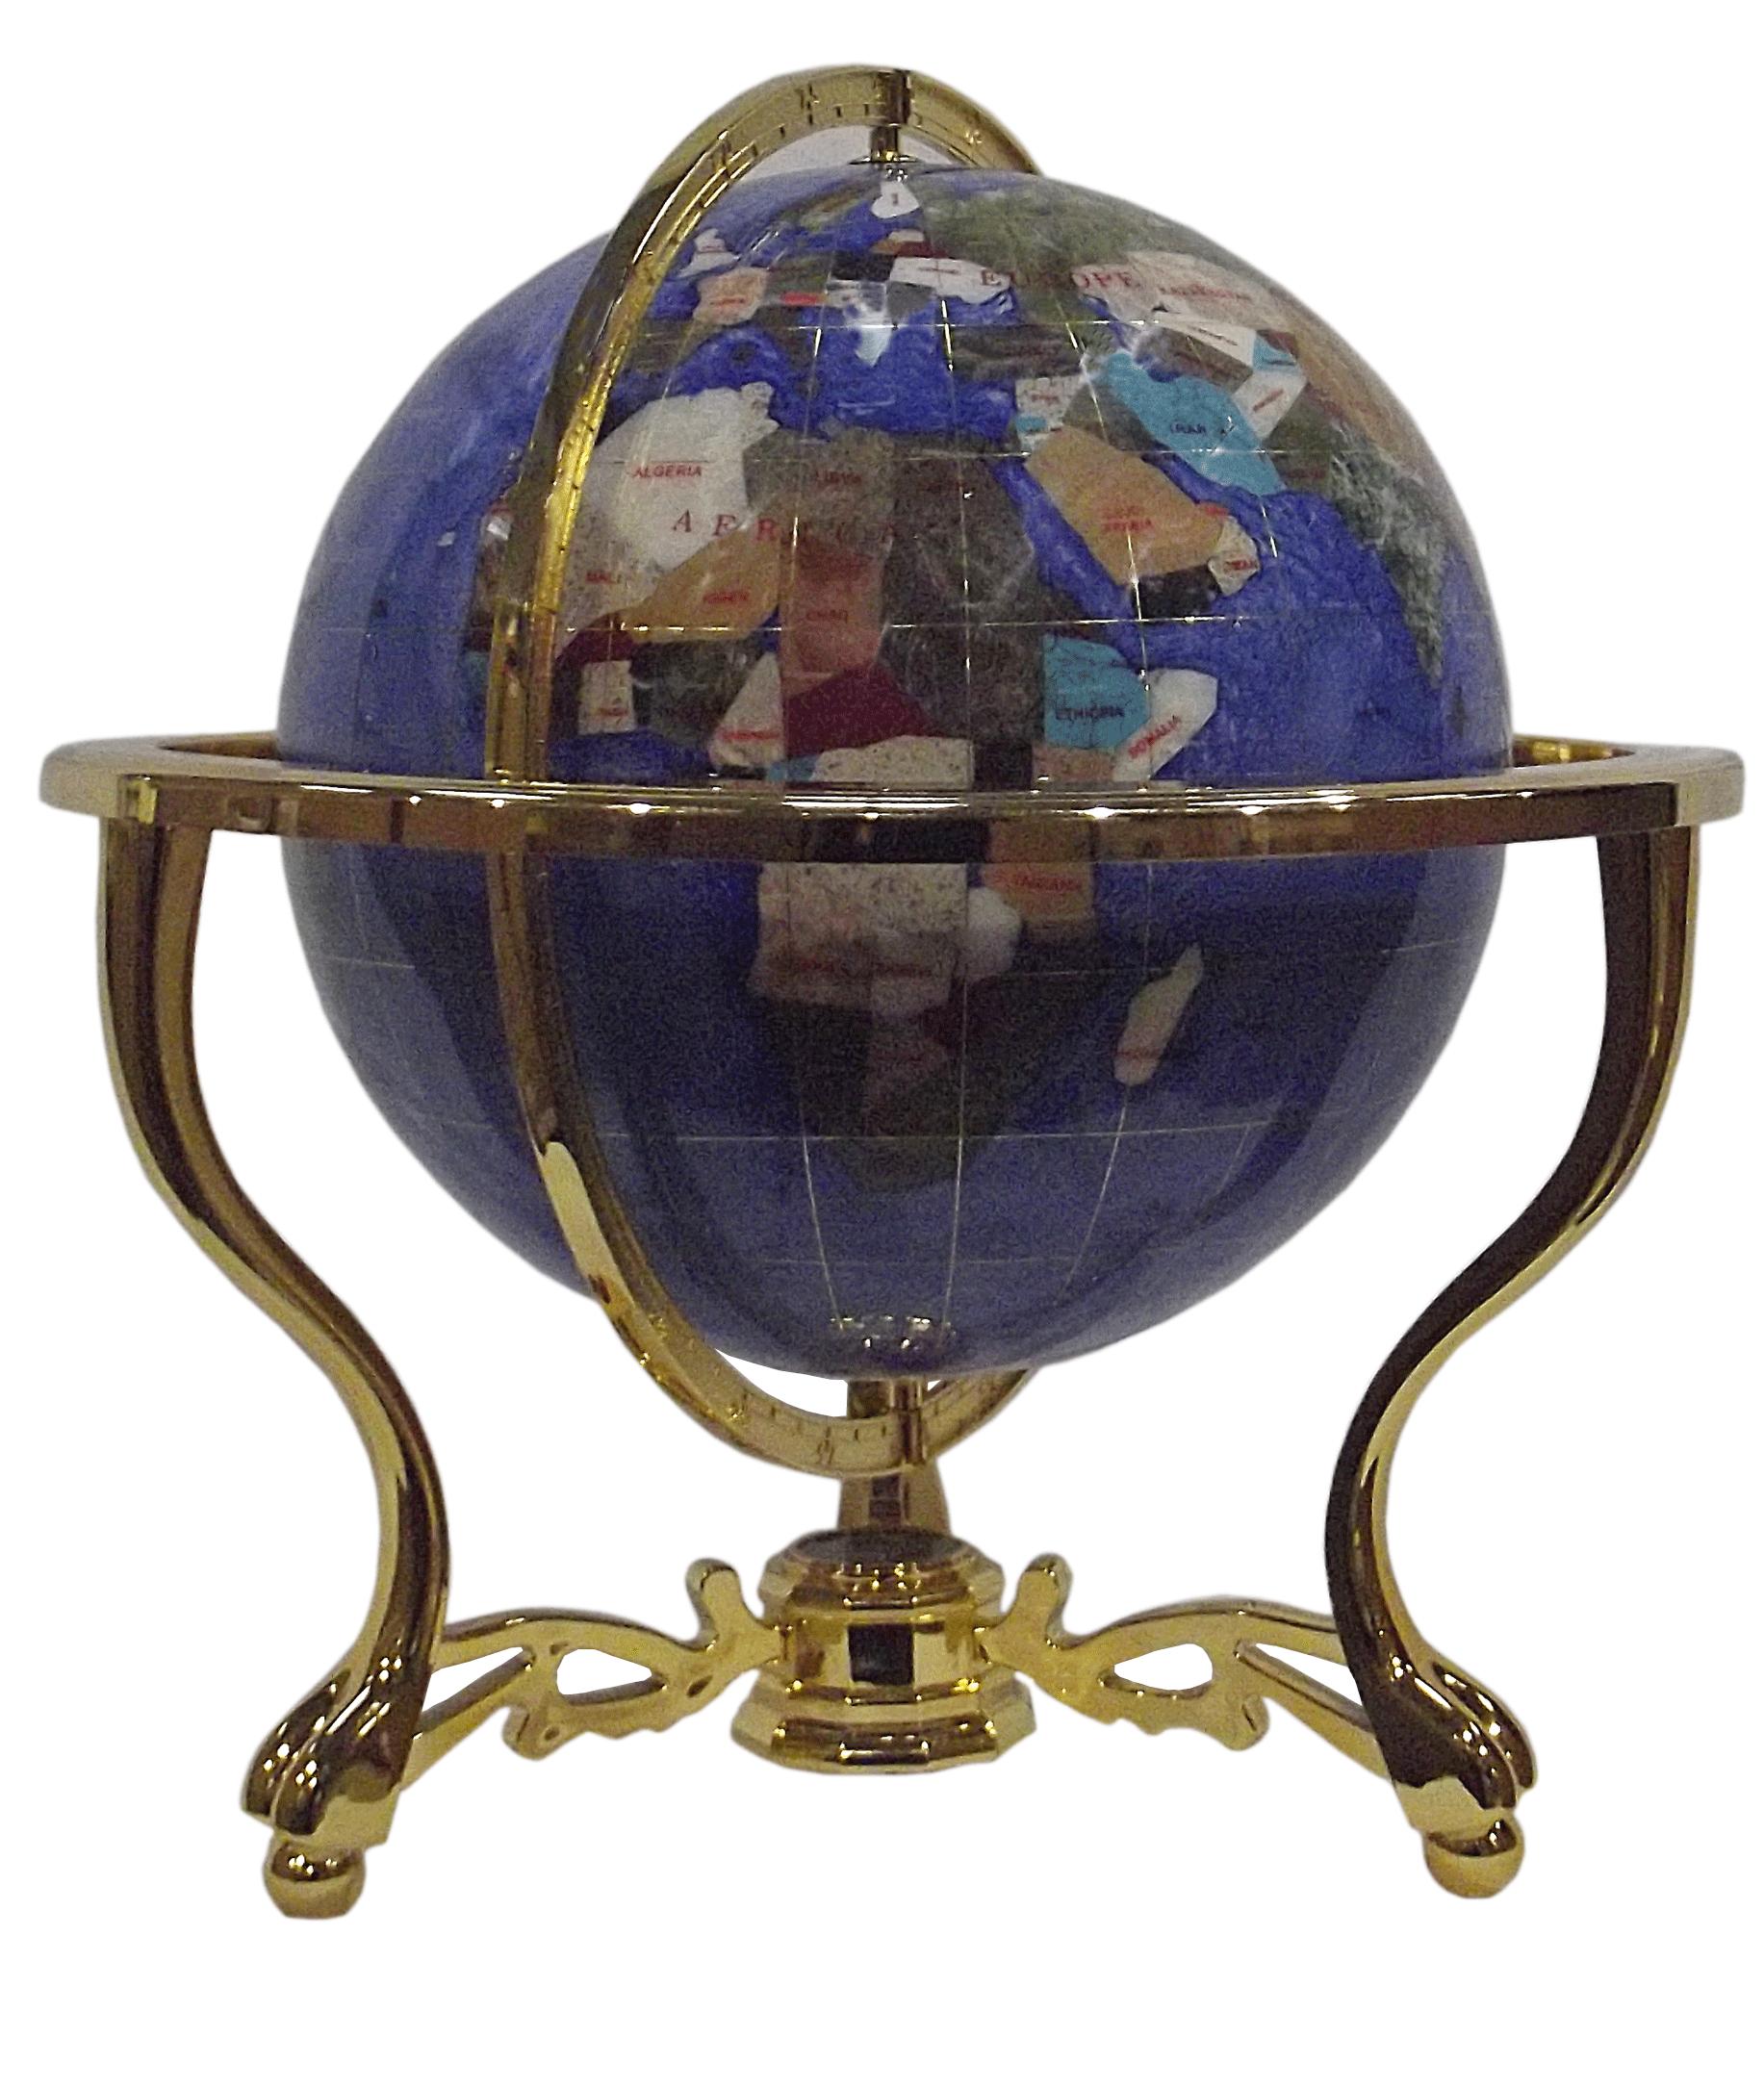 gemstone globe tabletop 33 cm blue cambridge 3 leg stand gold finish gemmoglobe 3pb 33 d bleu c. Black Bedroom Furniture Sets. Home Design Ideas